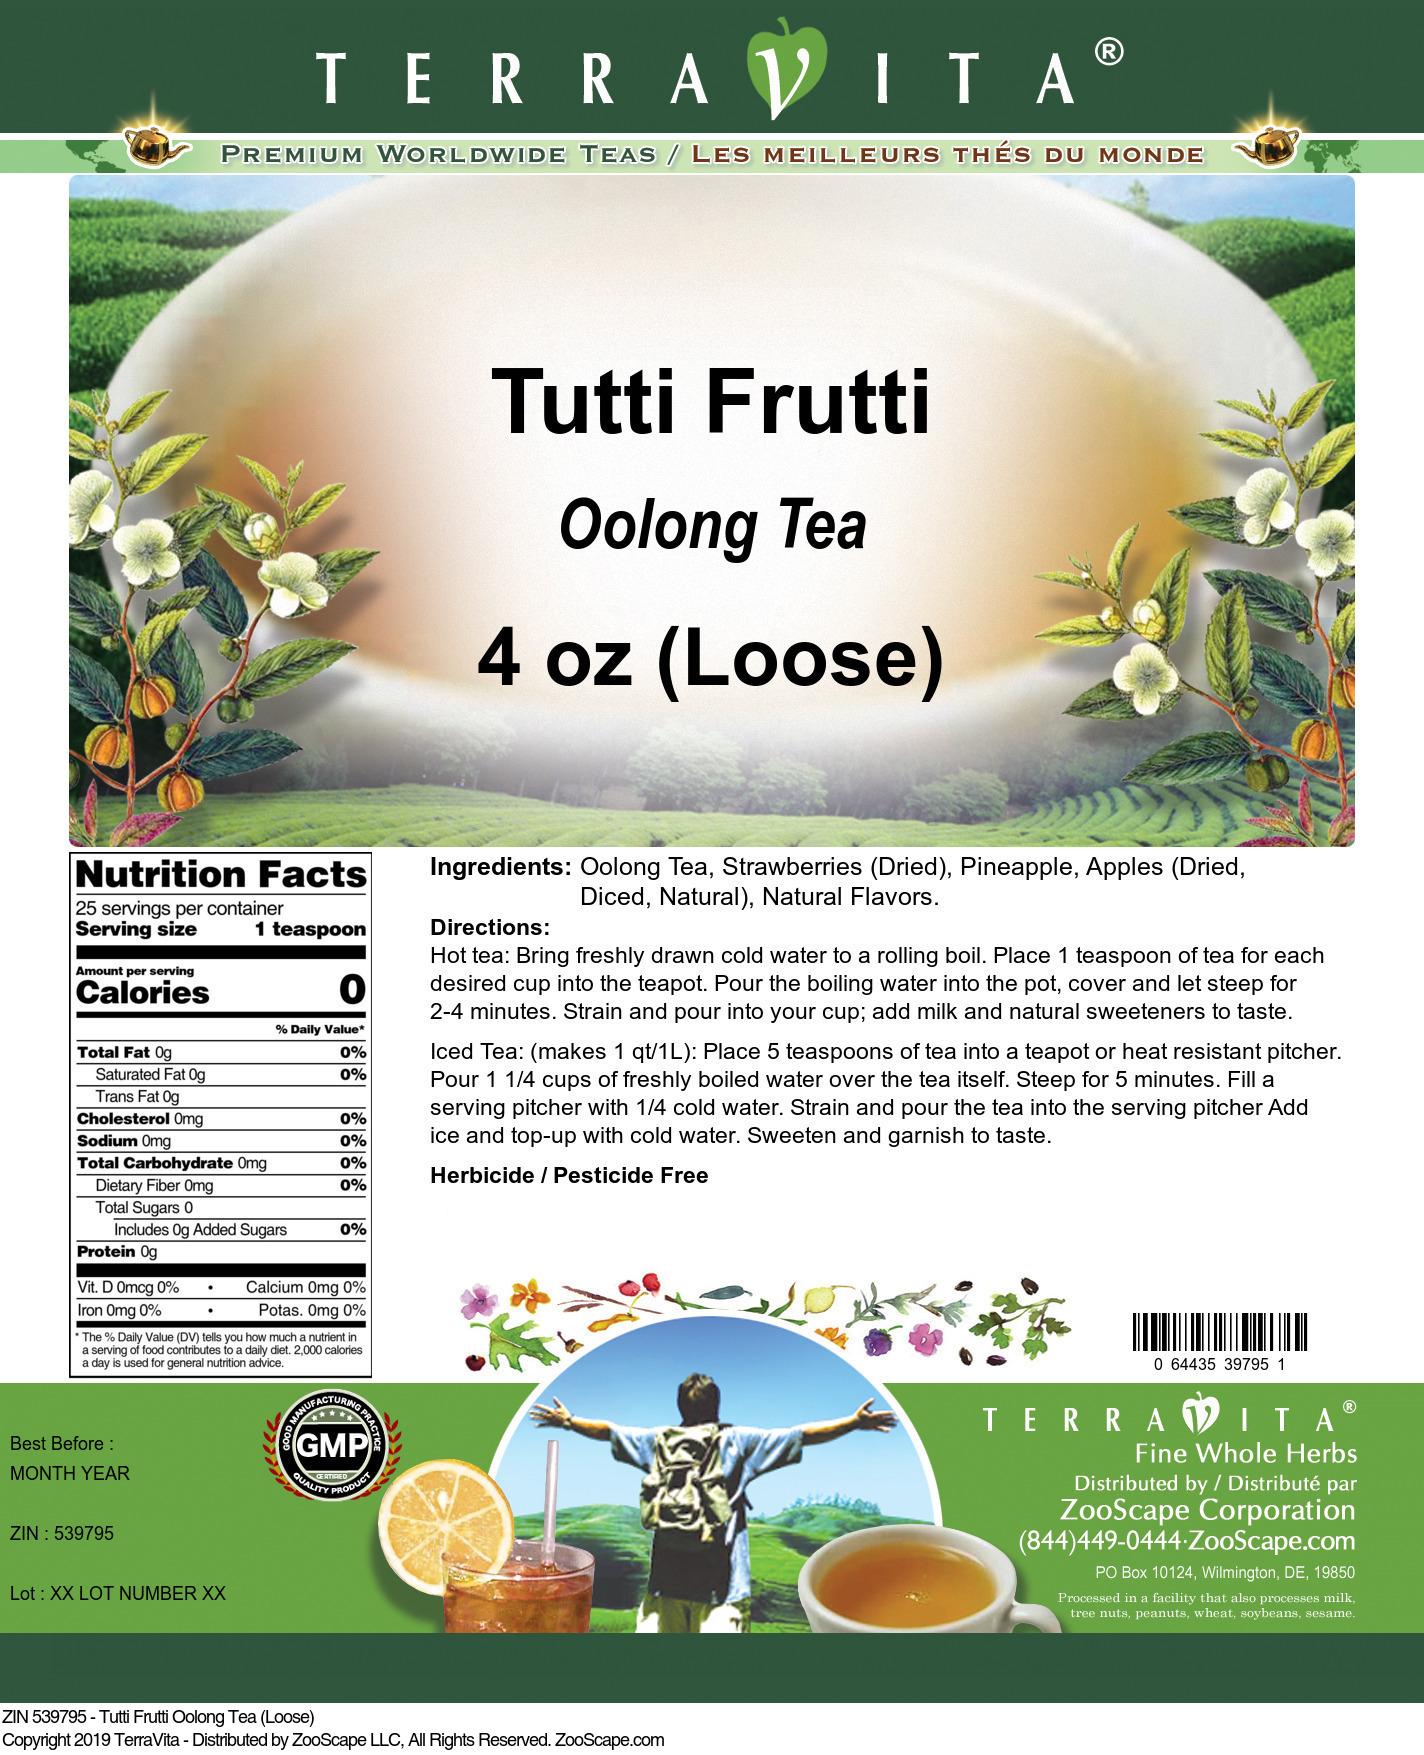 Tutti Frutti Oolong Tea